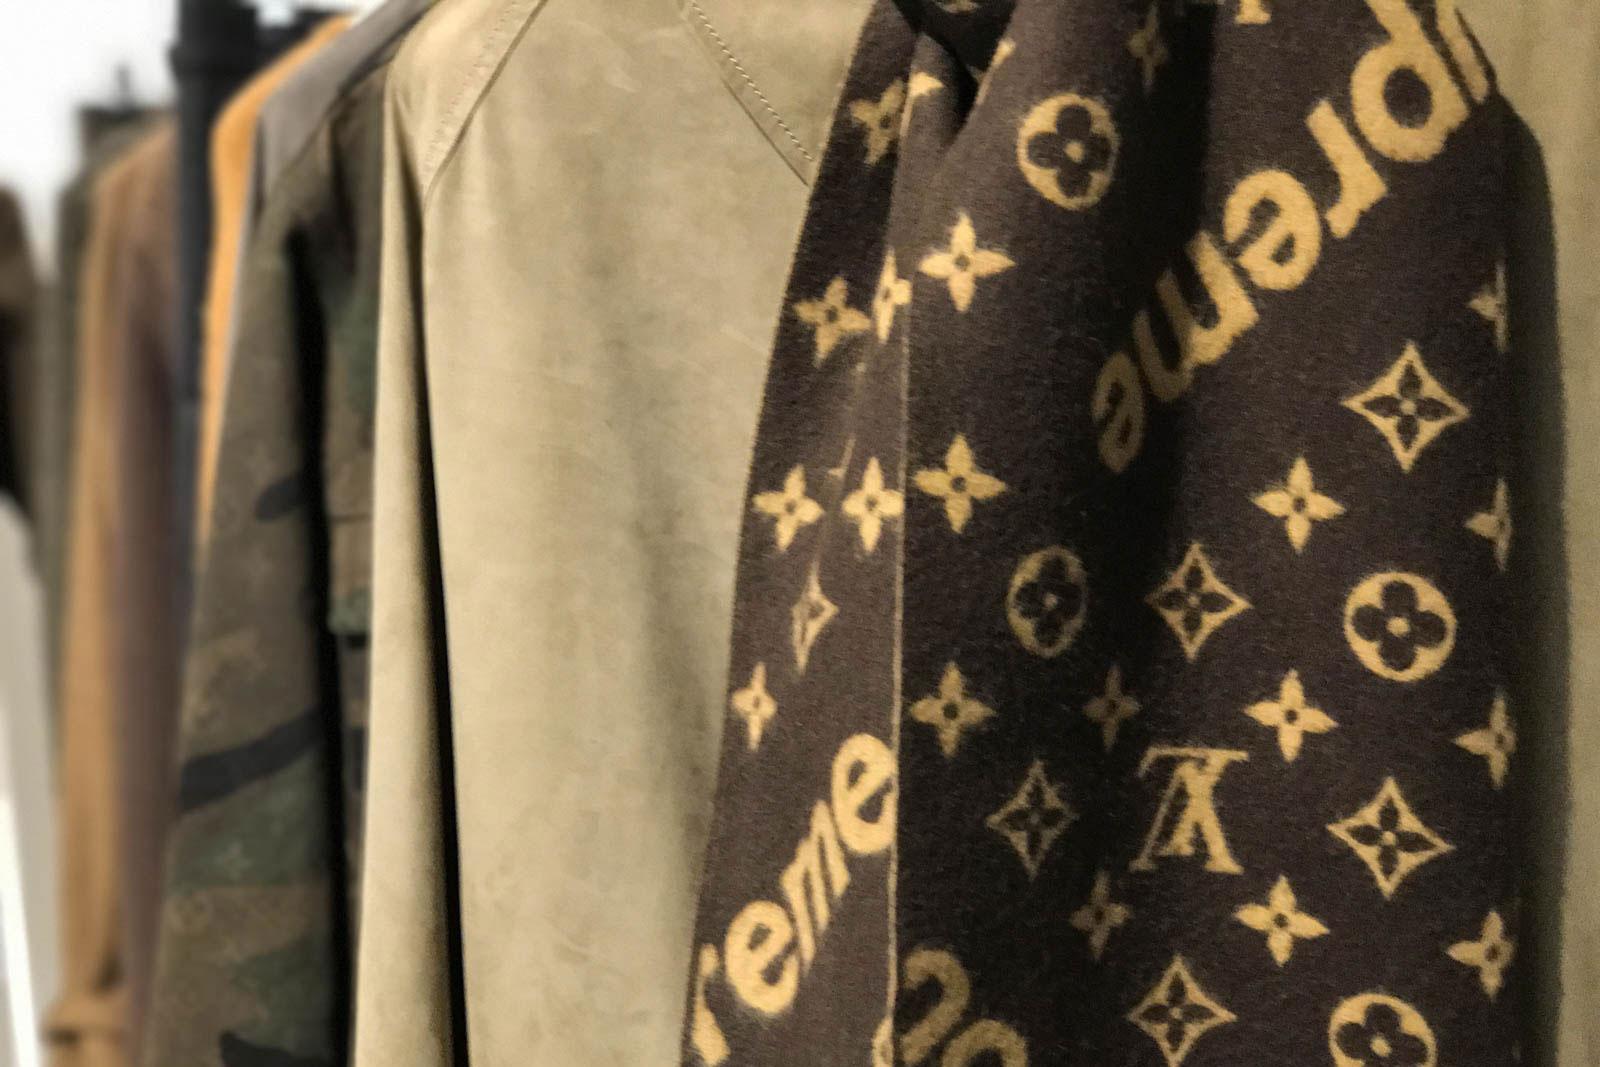 Supreme x Louis Vuitton 2017 Fall/Winter Closer Look Showroom - 3703536